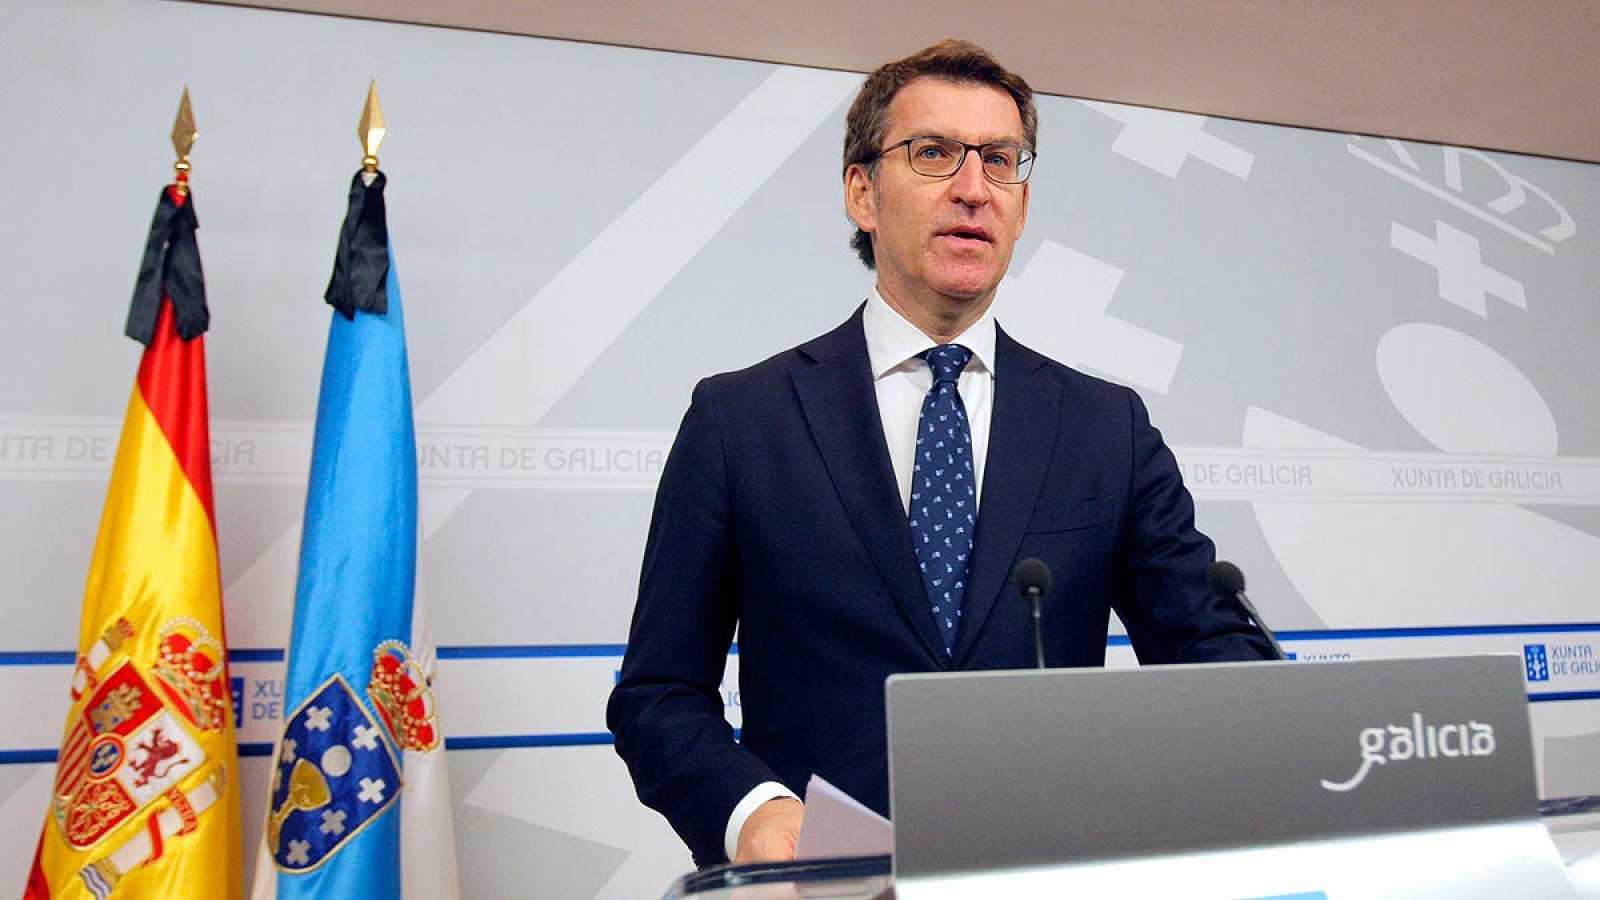 Nuñez Feijóo anuncia que optará a la reelección para un tercer mandato en Galicia